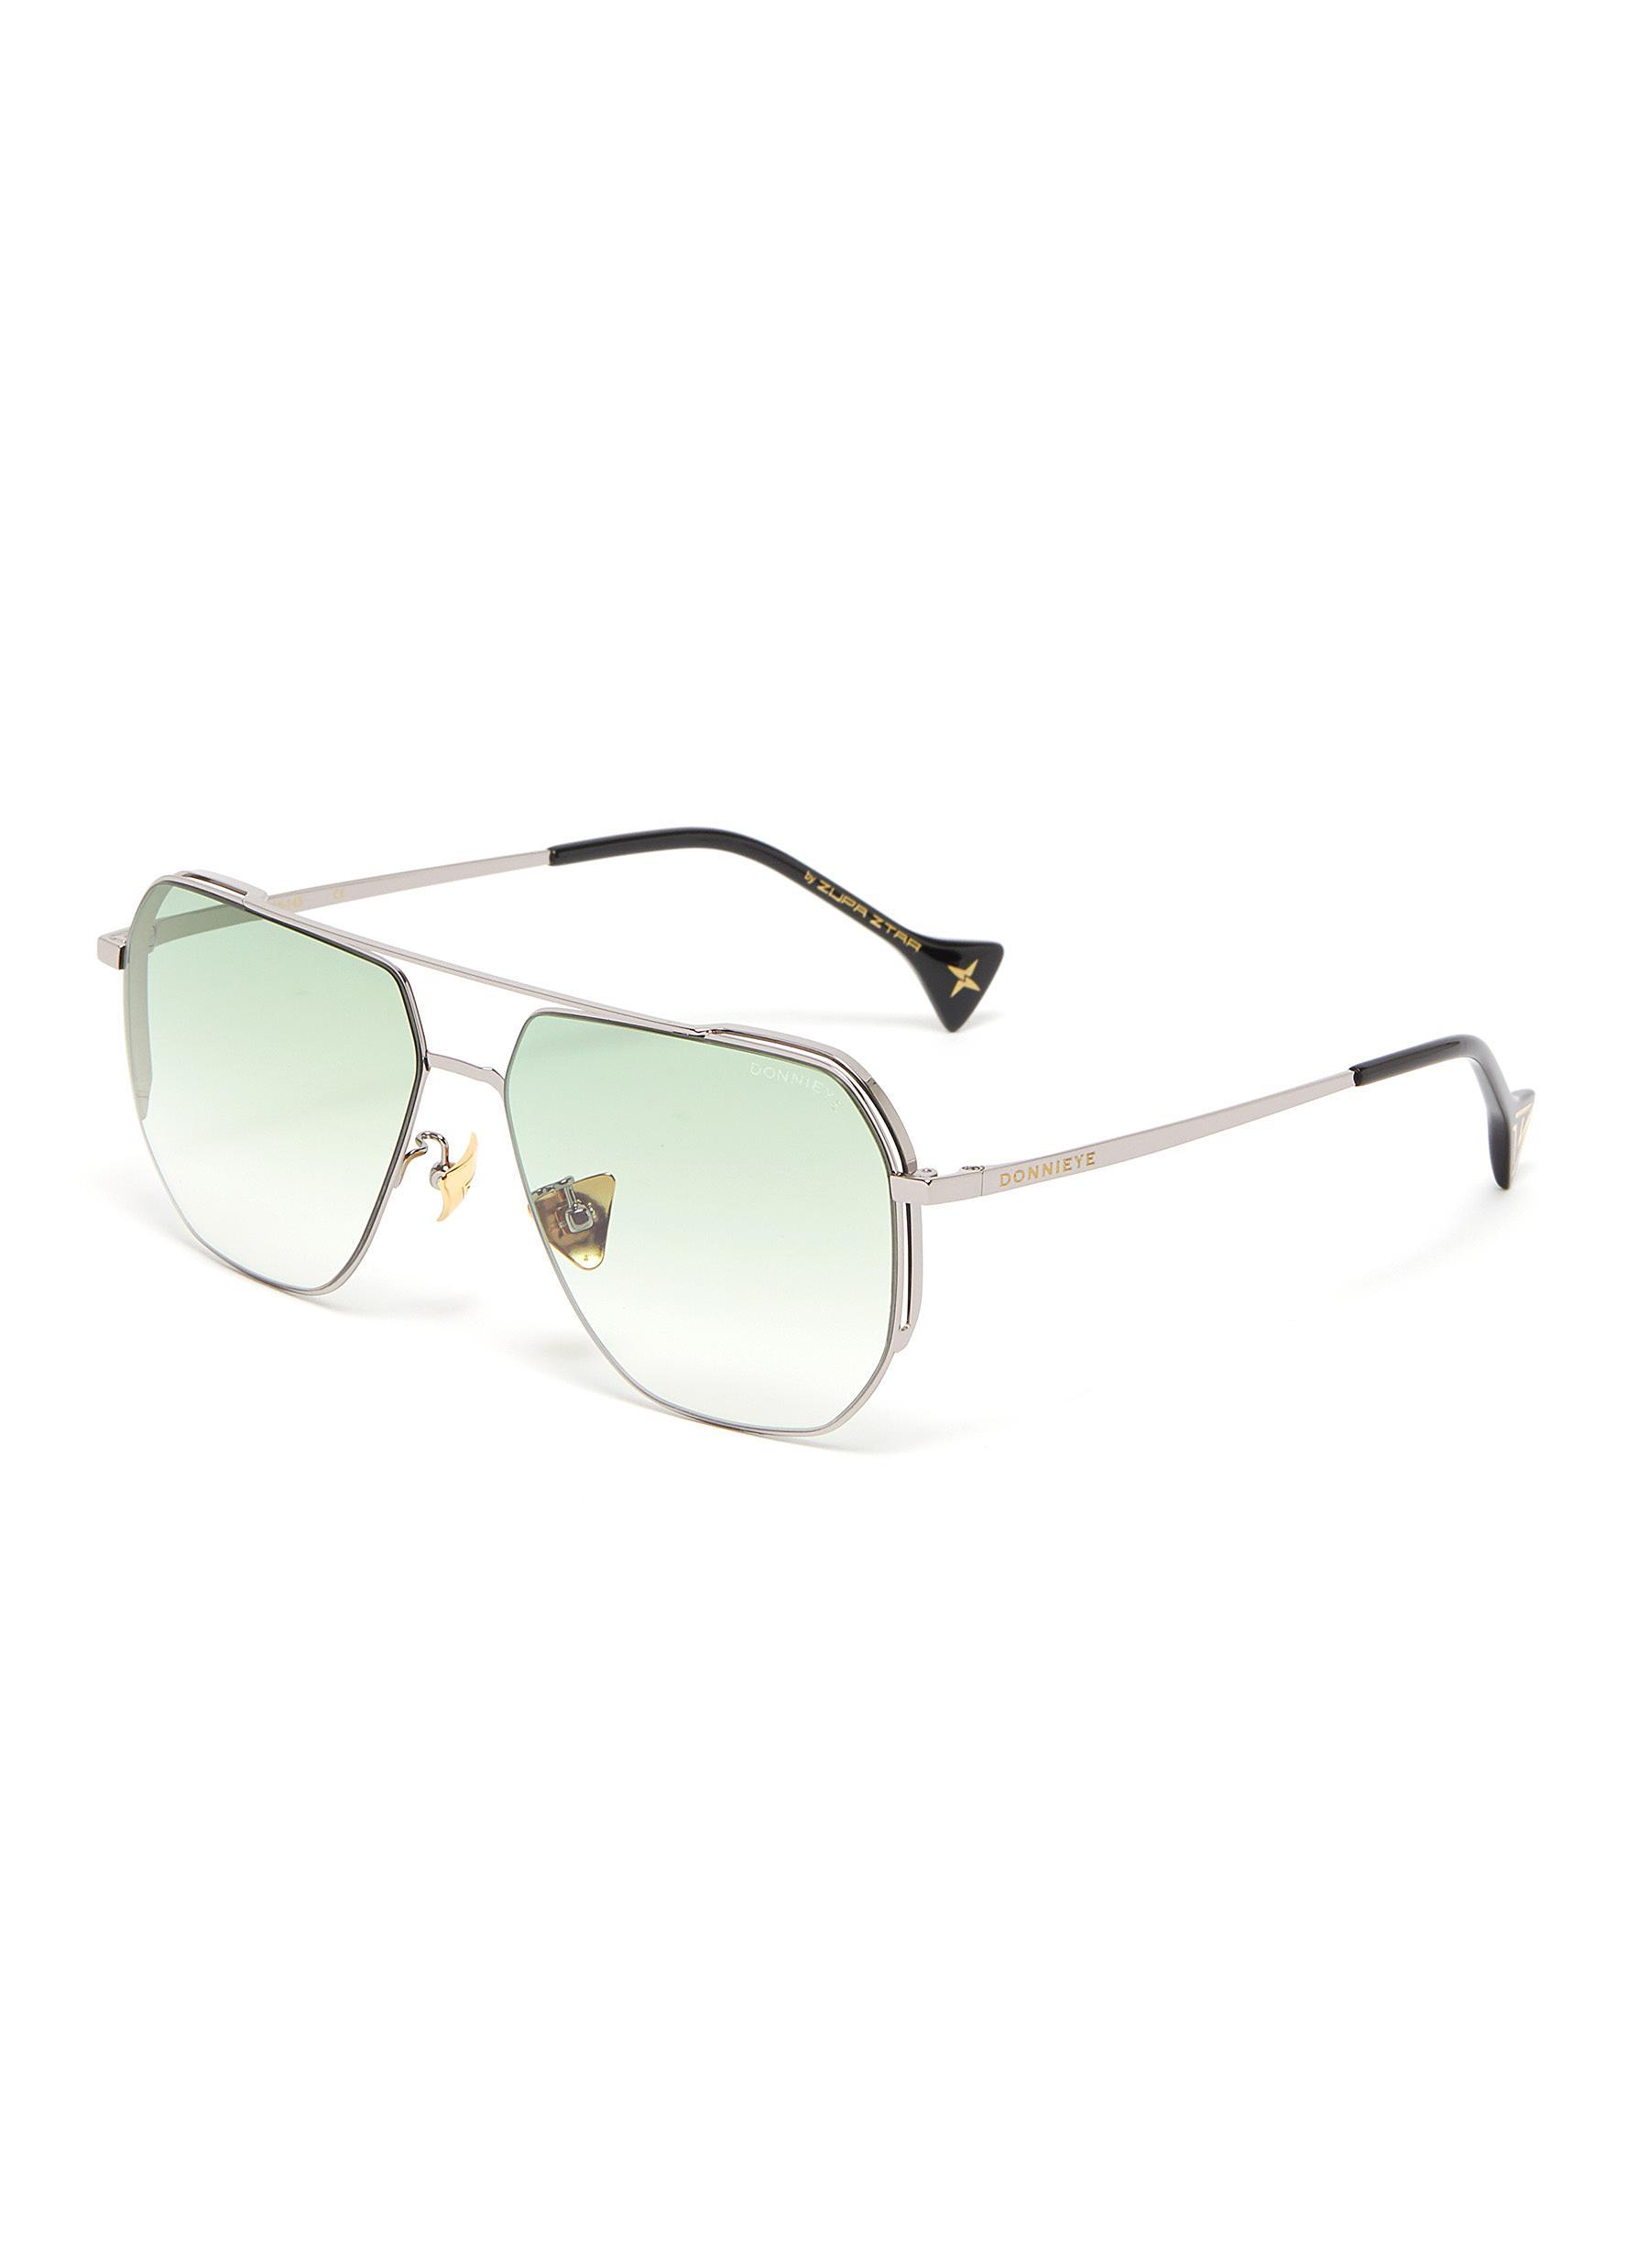 'Sagacious' Aviator sunglasses